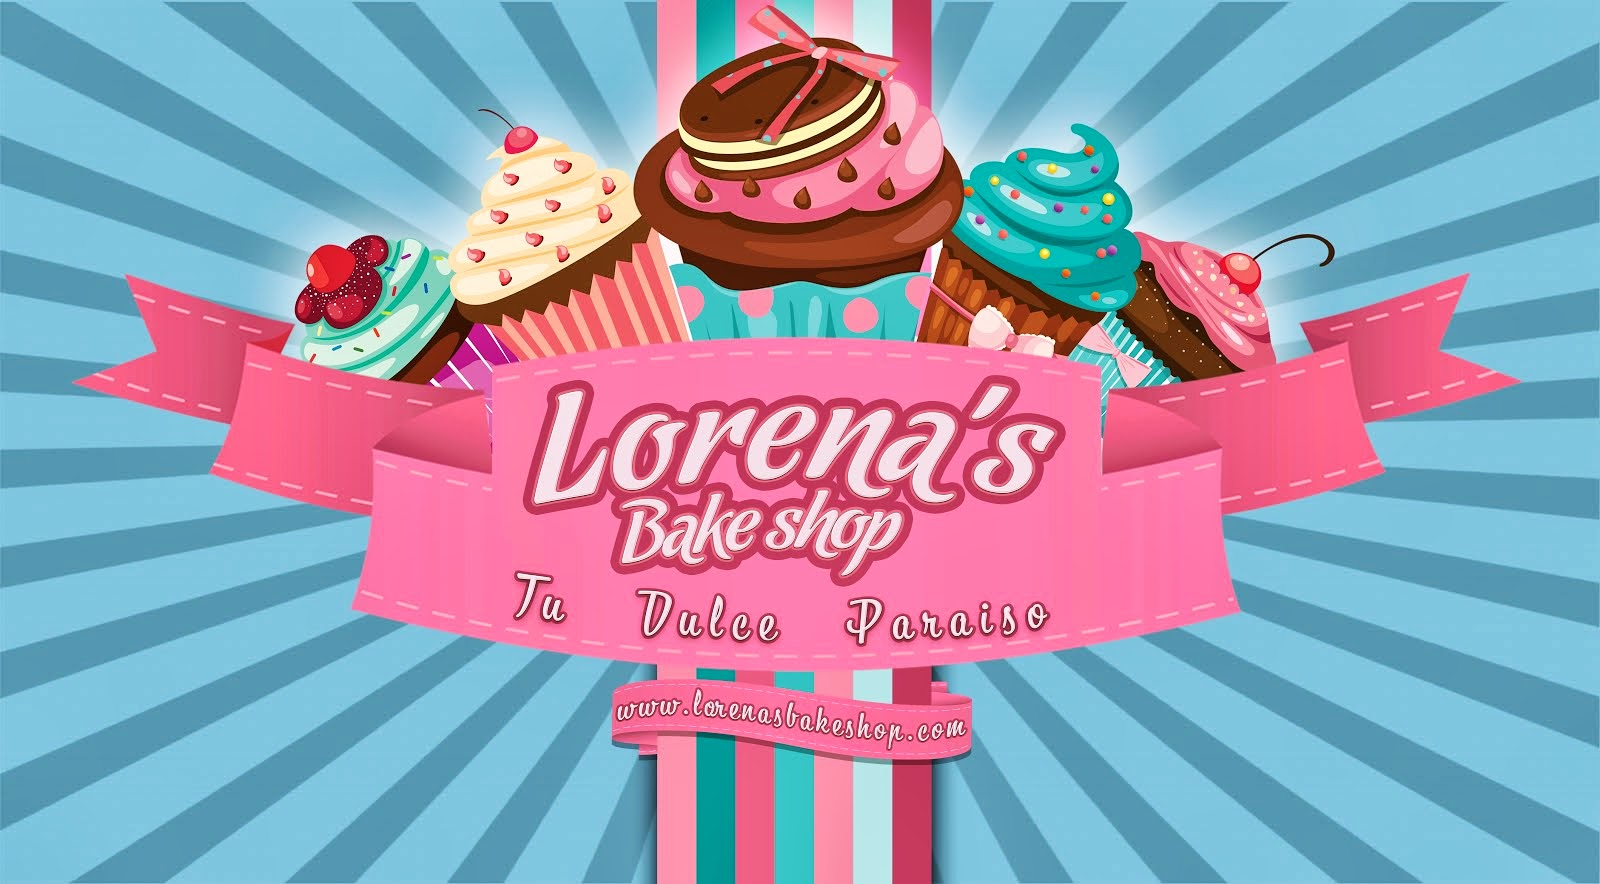 Lorena's Bake Shop